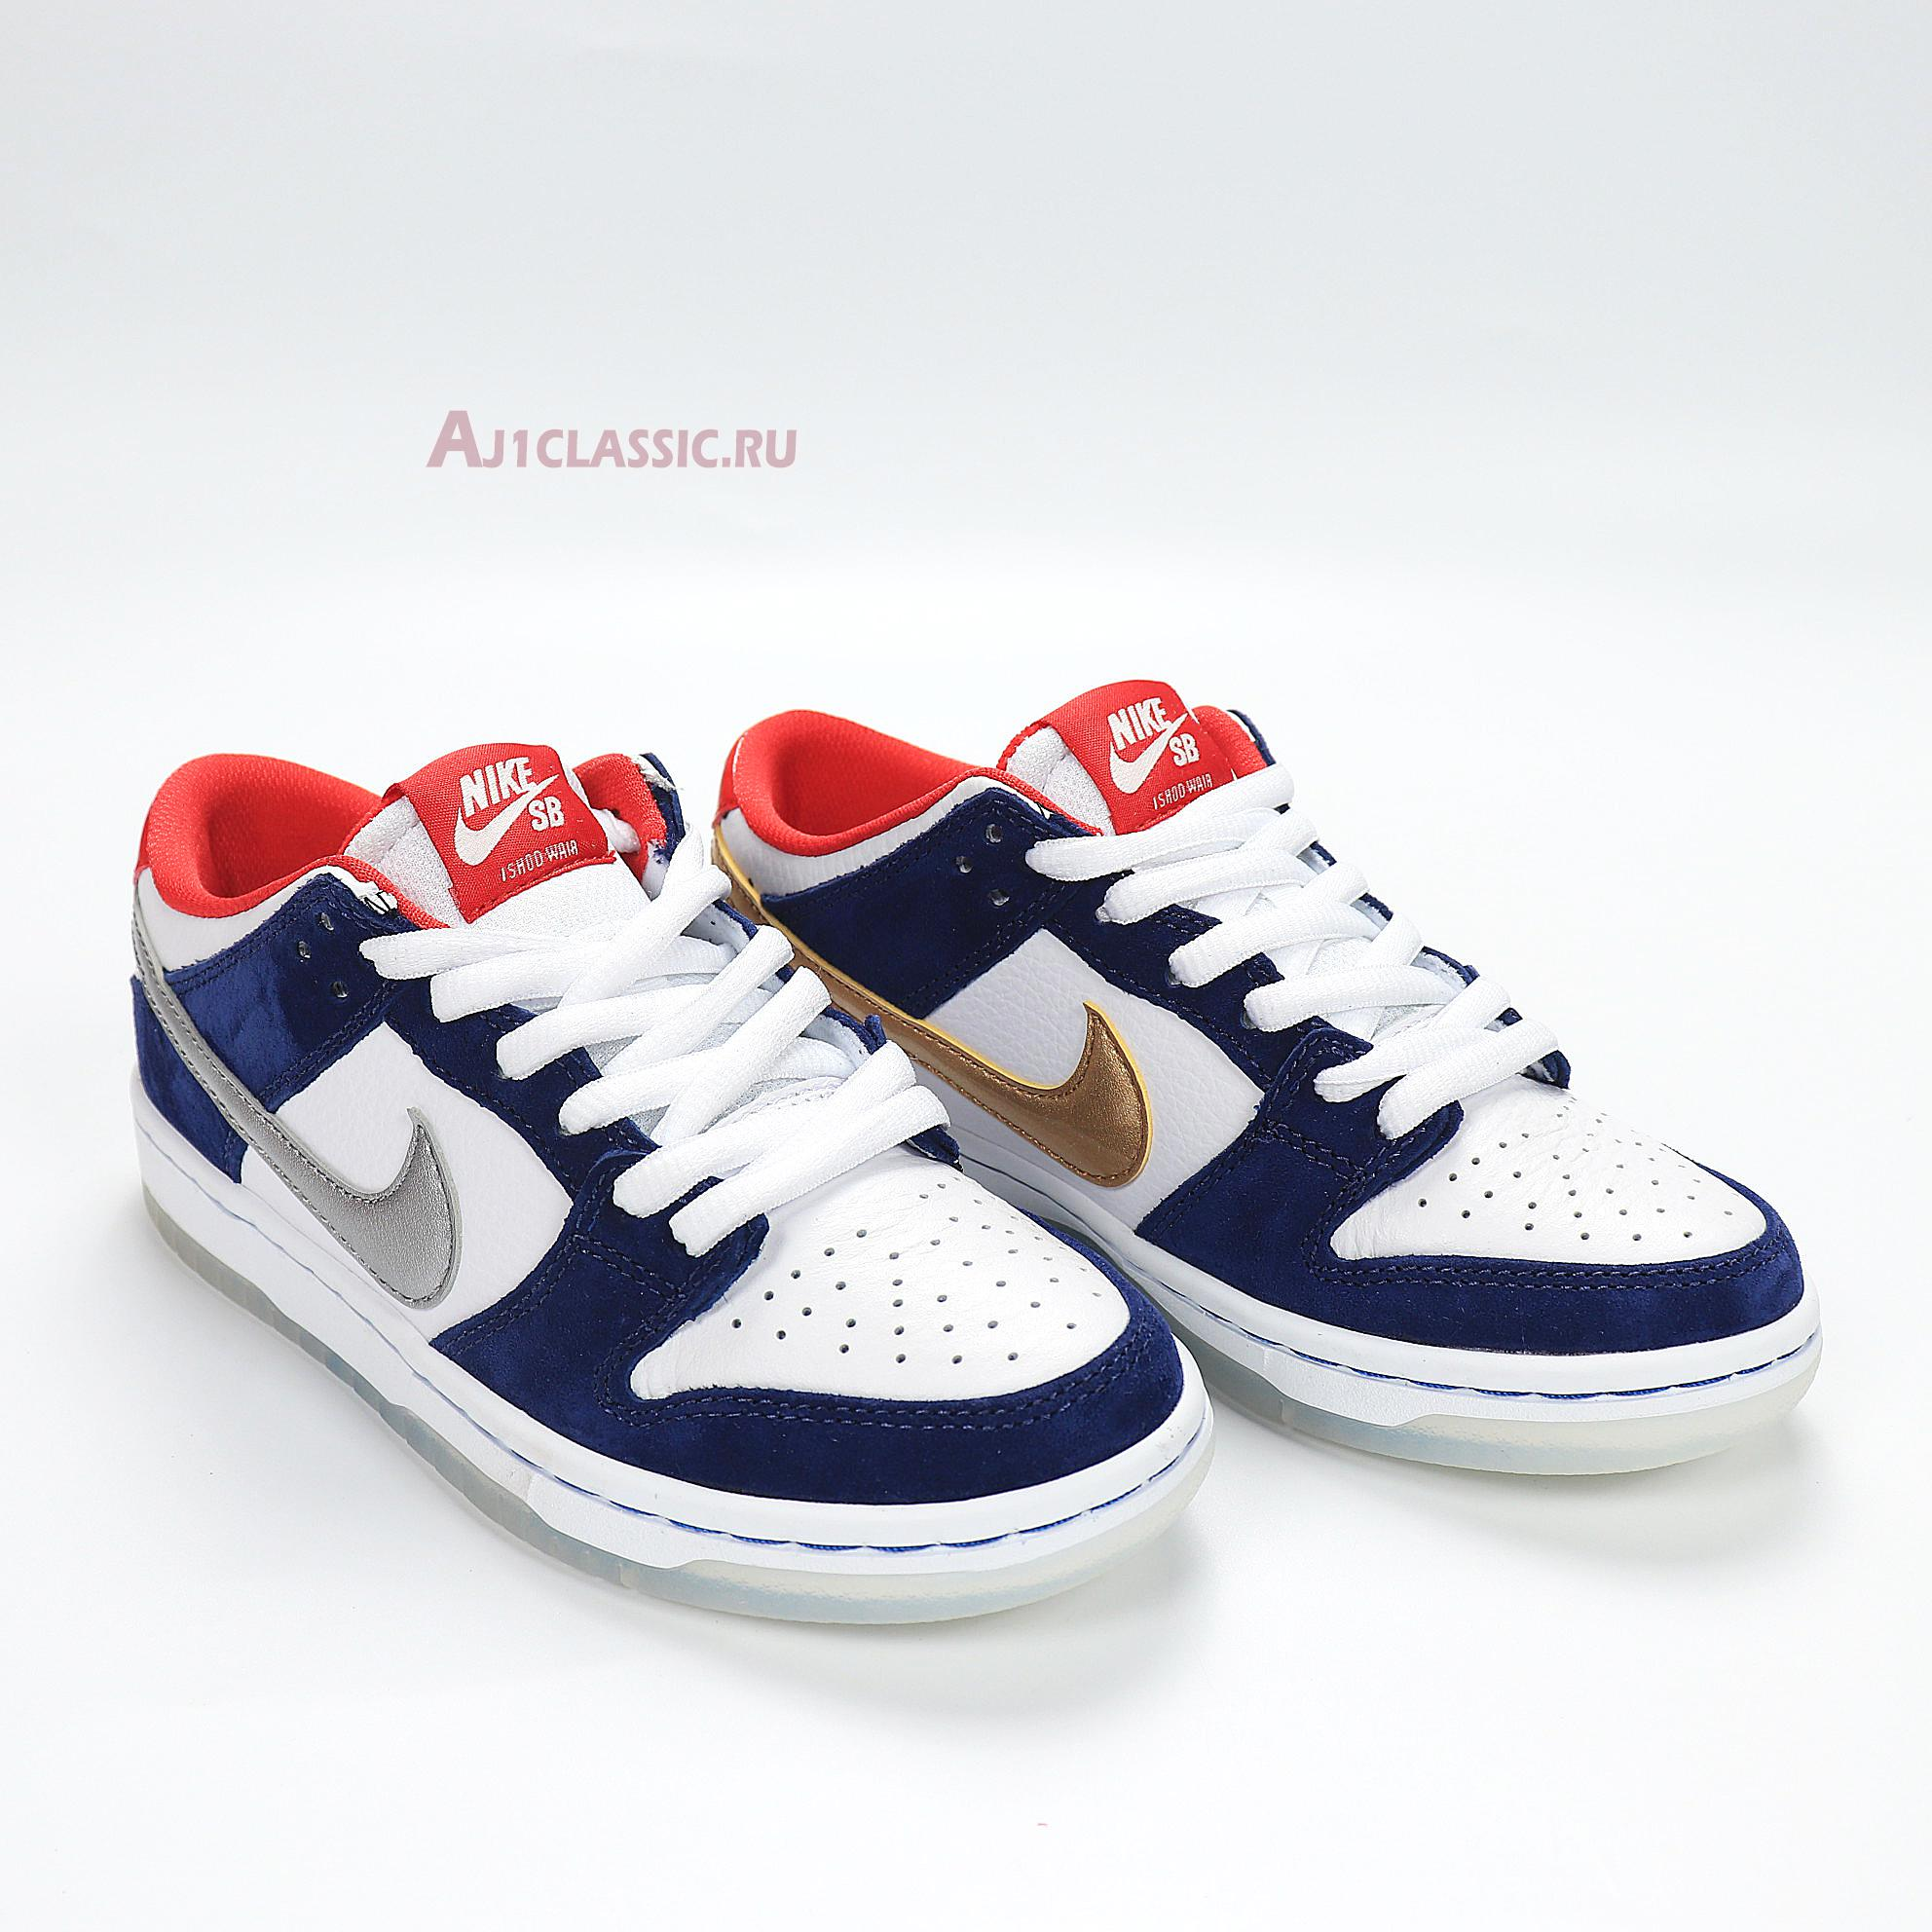 "Nike SB Dunk Low Pro ""Ishod Wair QS"" 839685-416"